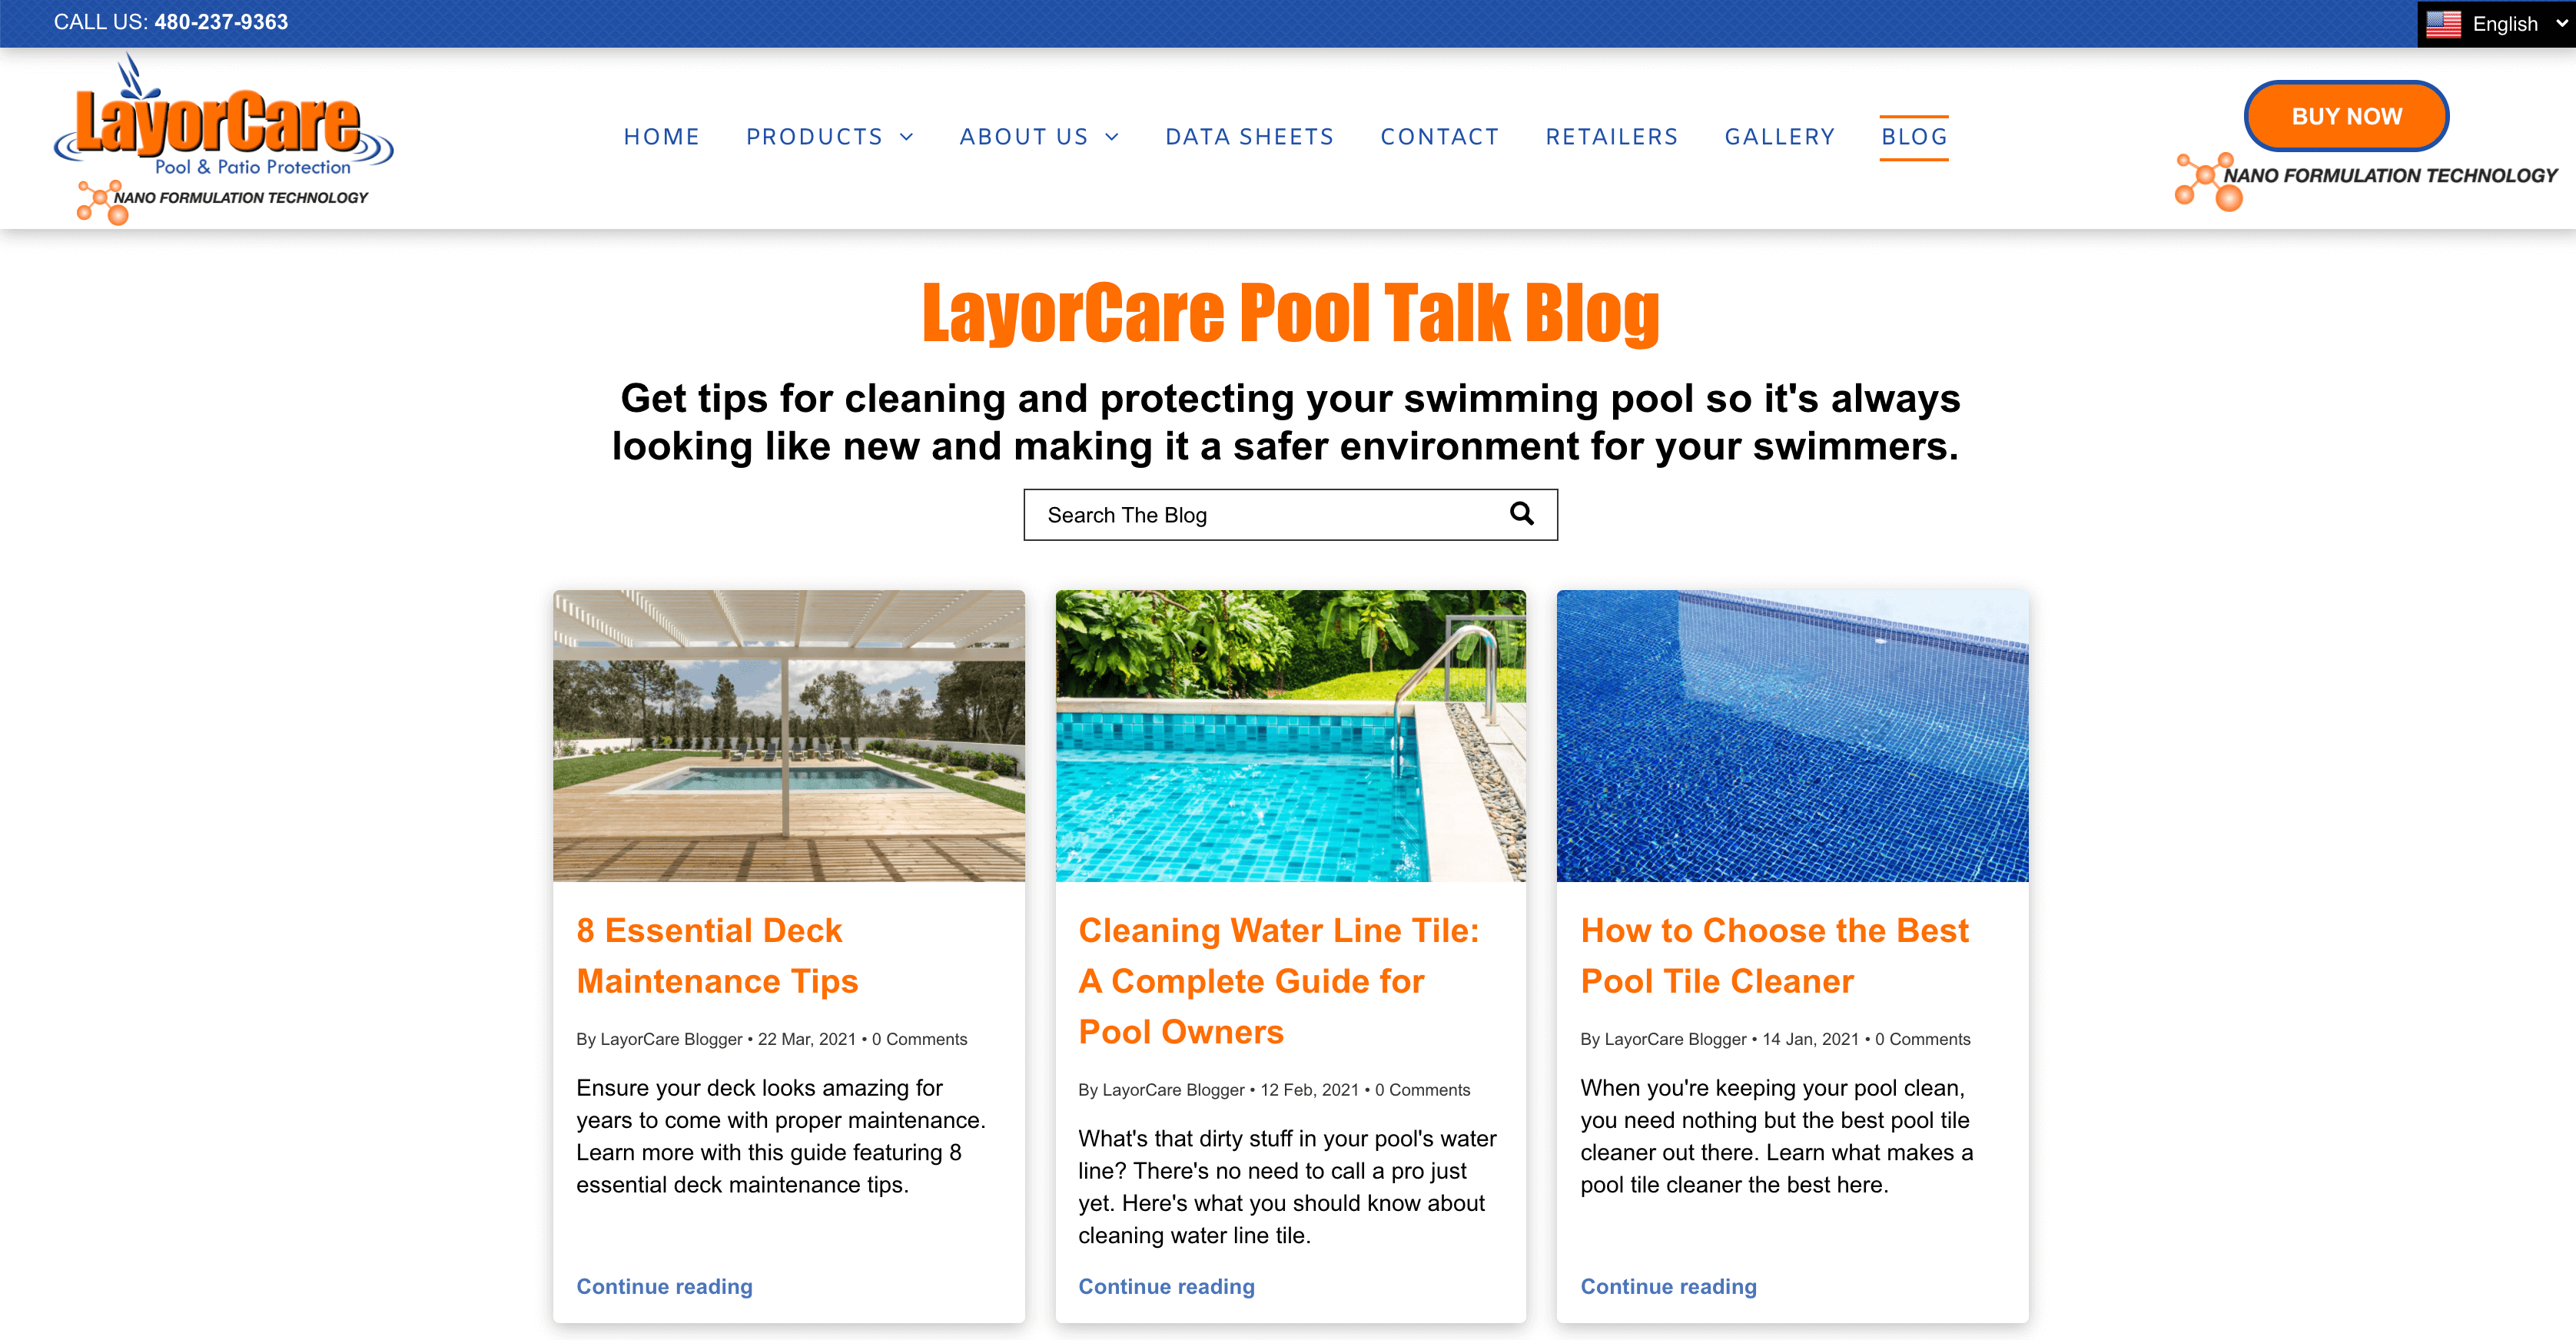 LayorCare pool talk blog